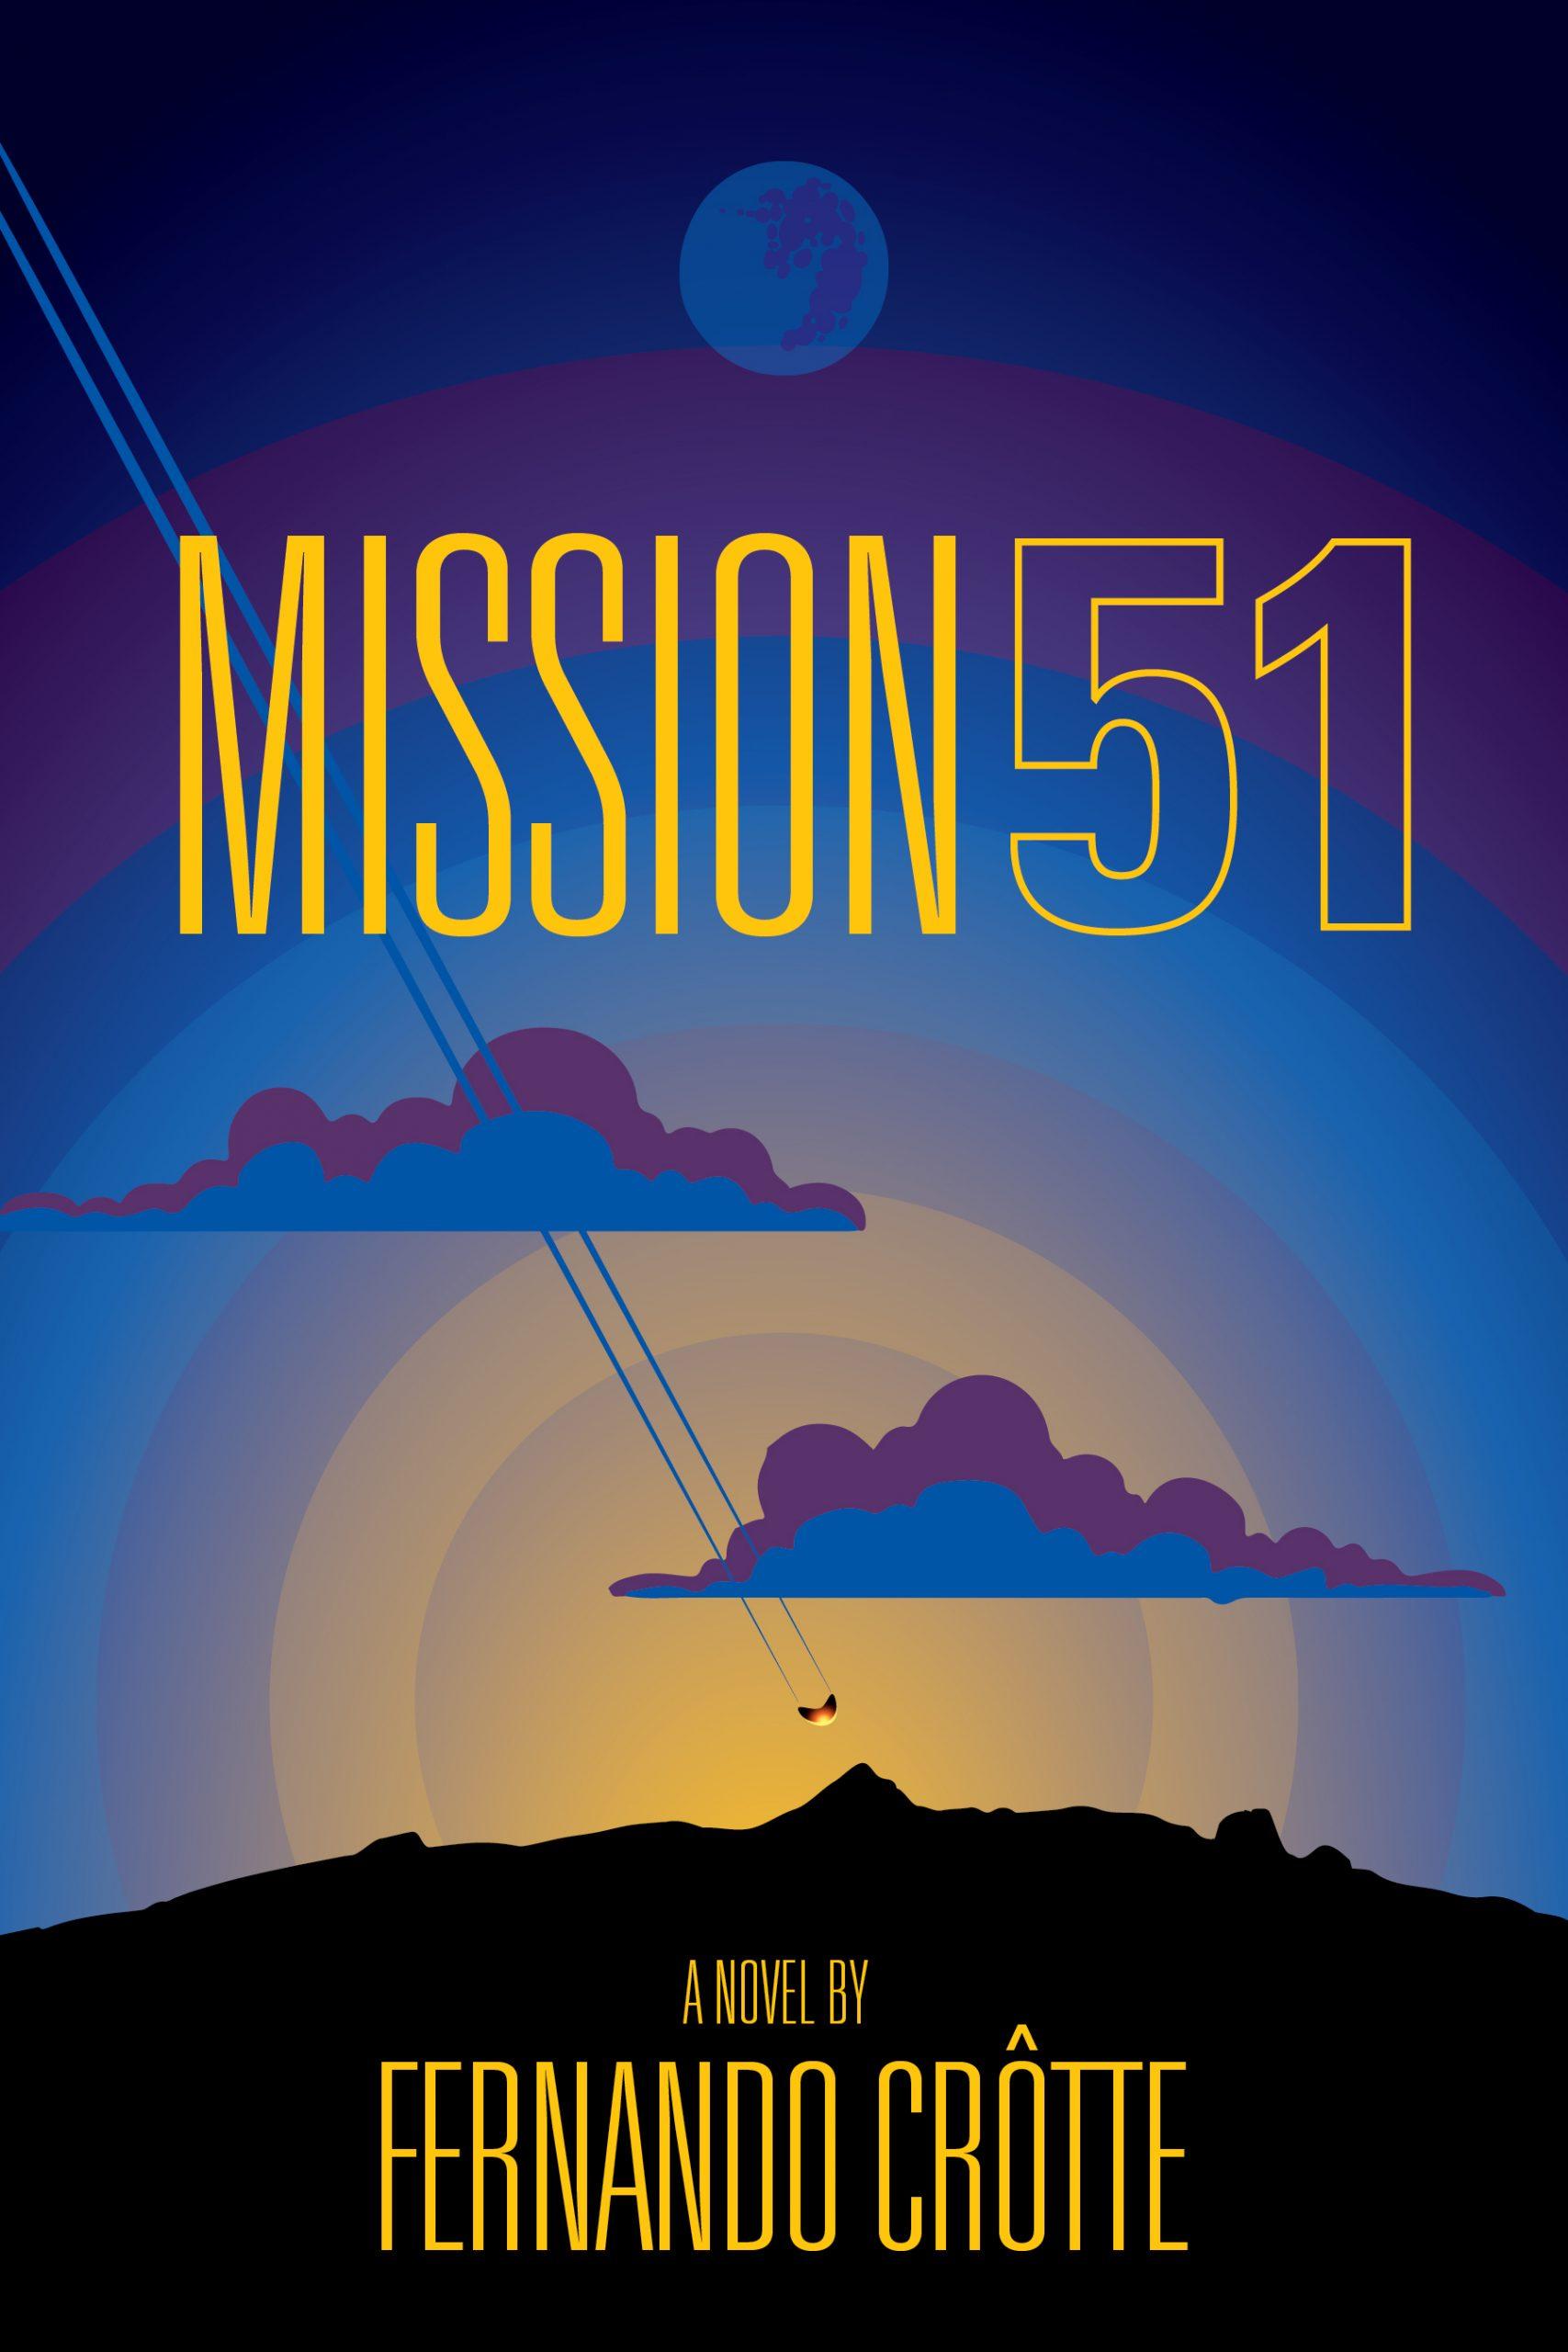 Mission 51, a full-length Sci-Fi novel, will publish on February 15, 2022